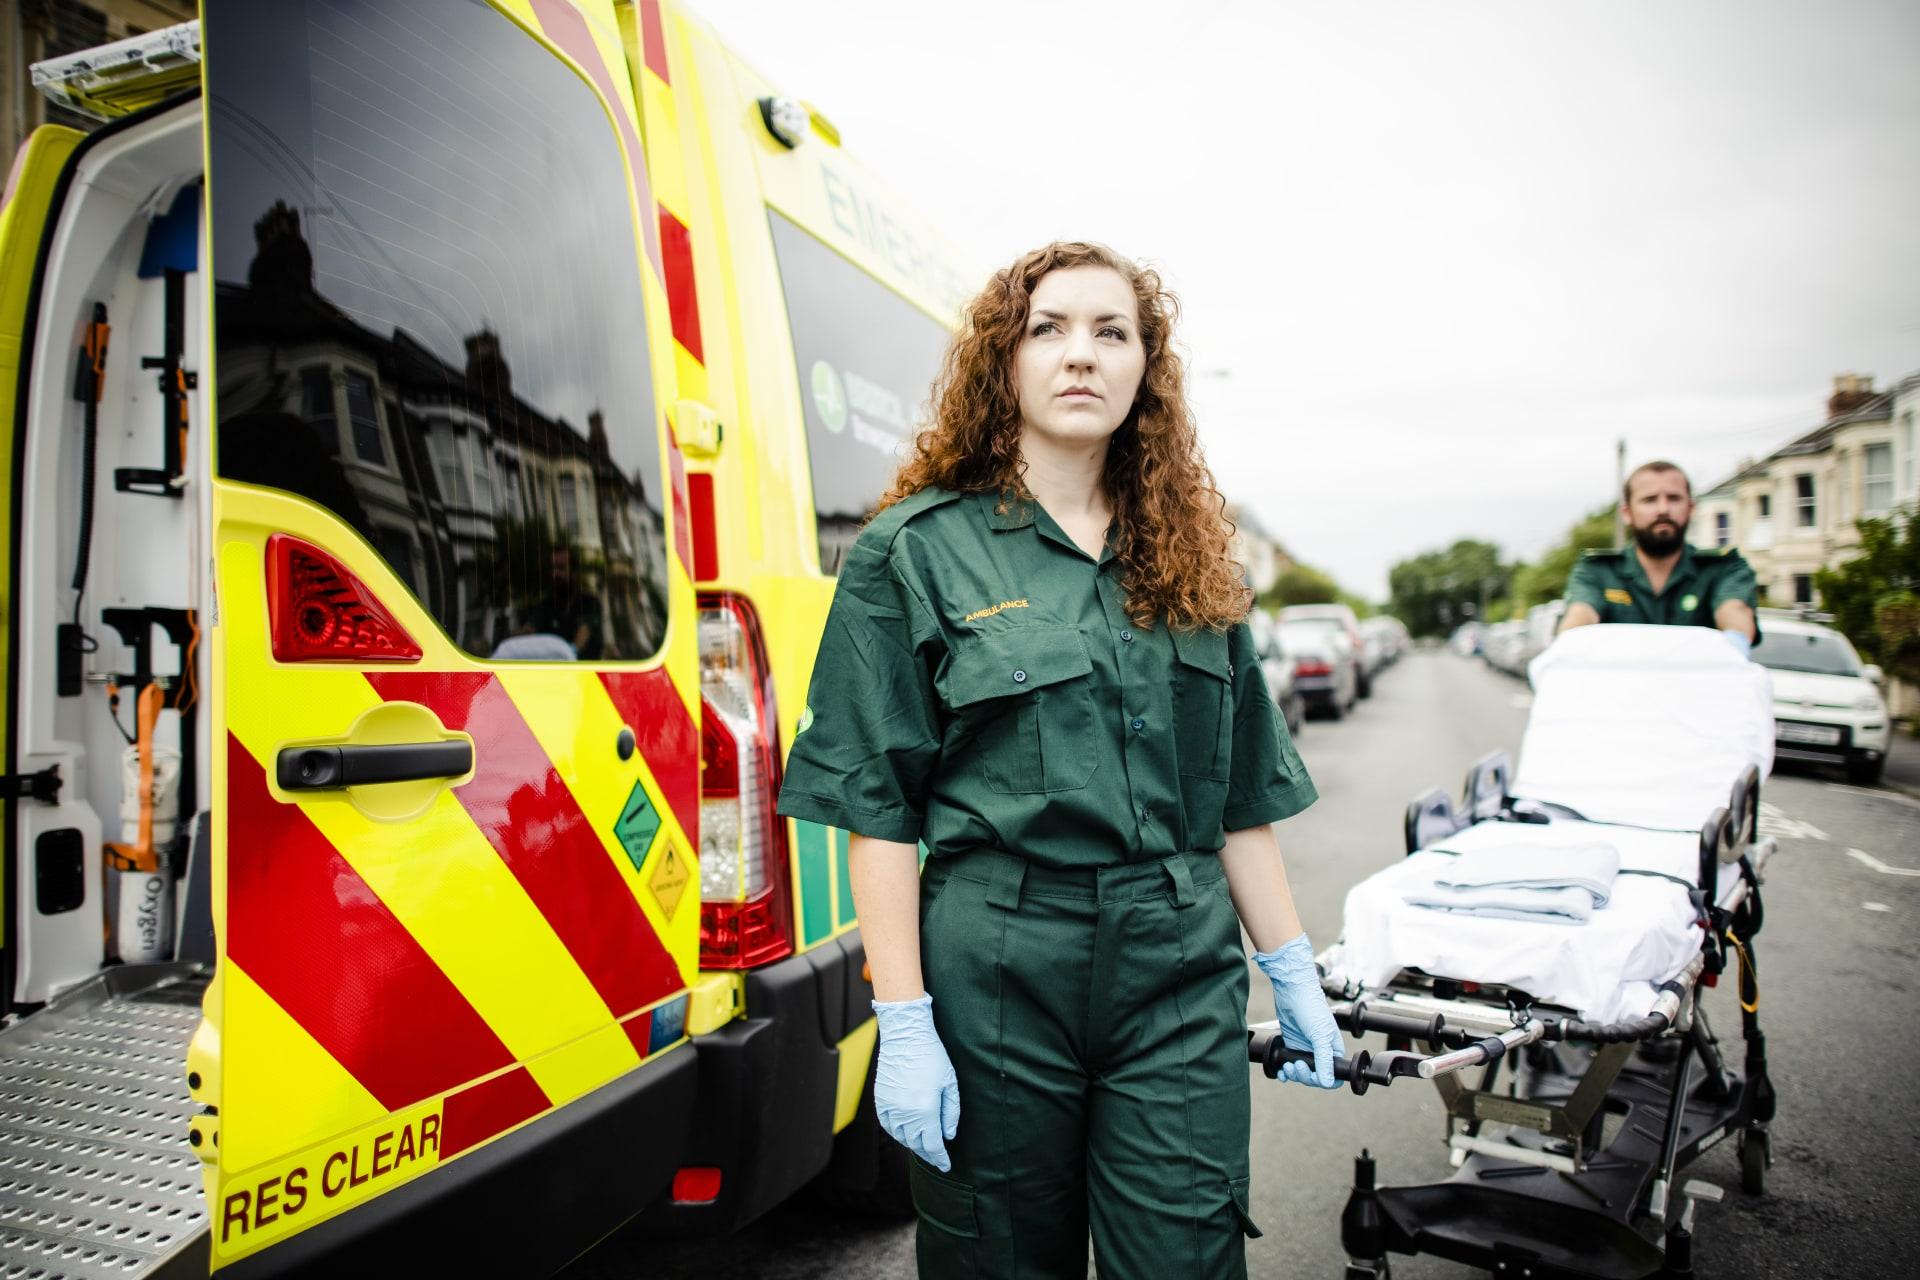 CARE4Notts Ambulance Services